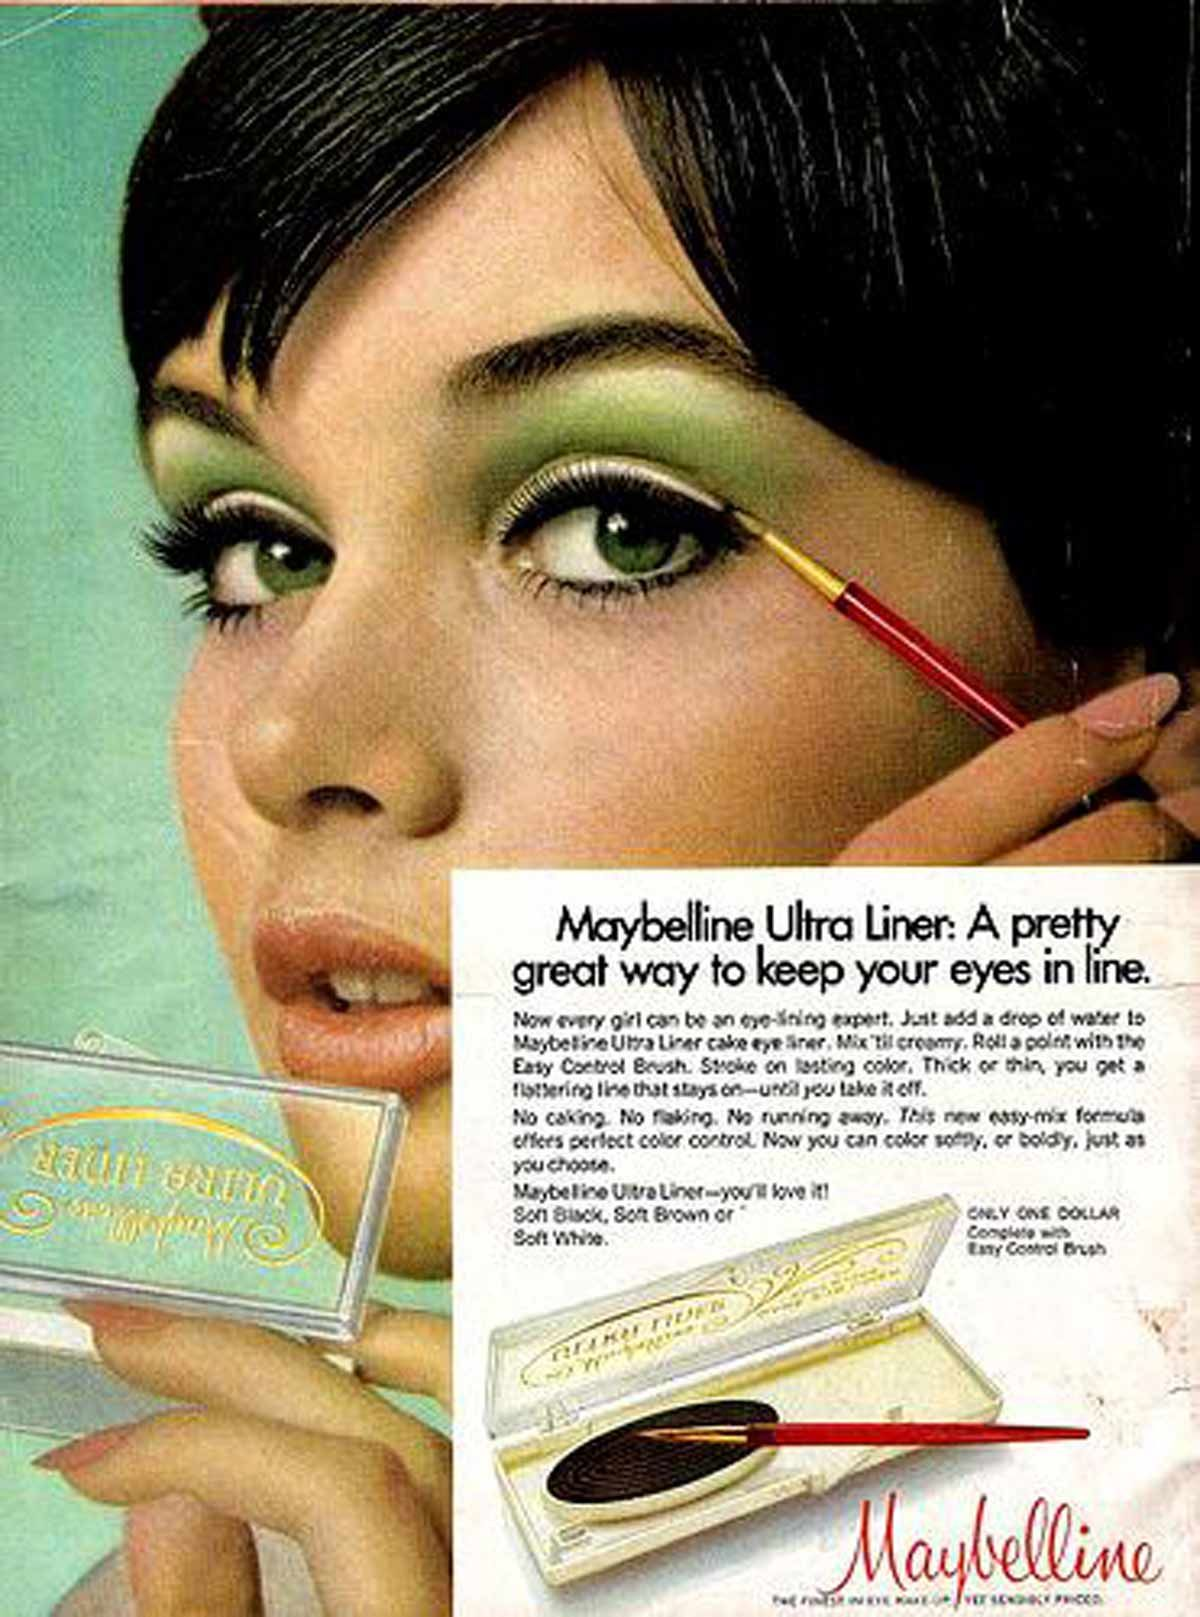 The 1970s Makeup Look 5 key Points Vintage makeup ads